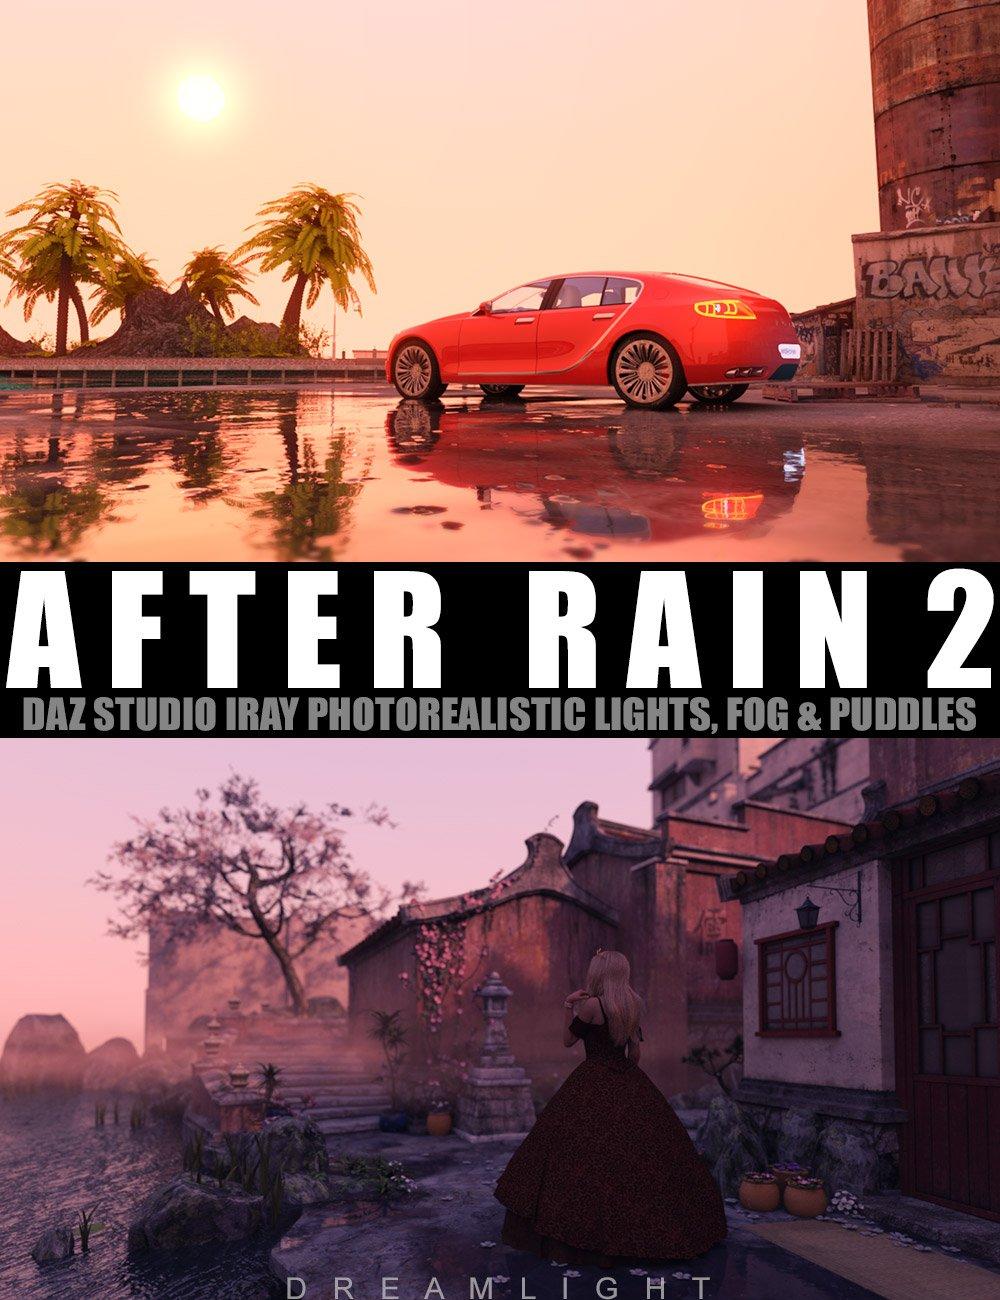 After Rain 2 by: Dreamlight, 3D Models by Daz 3D